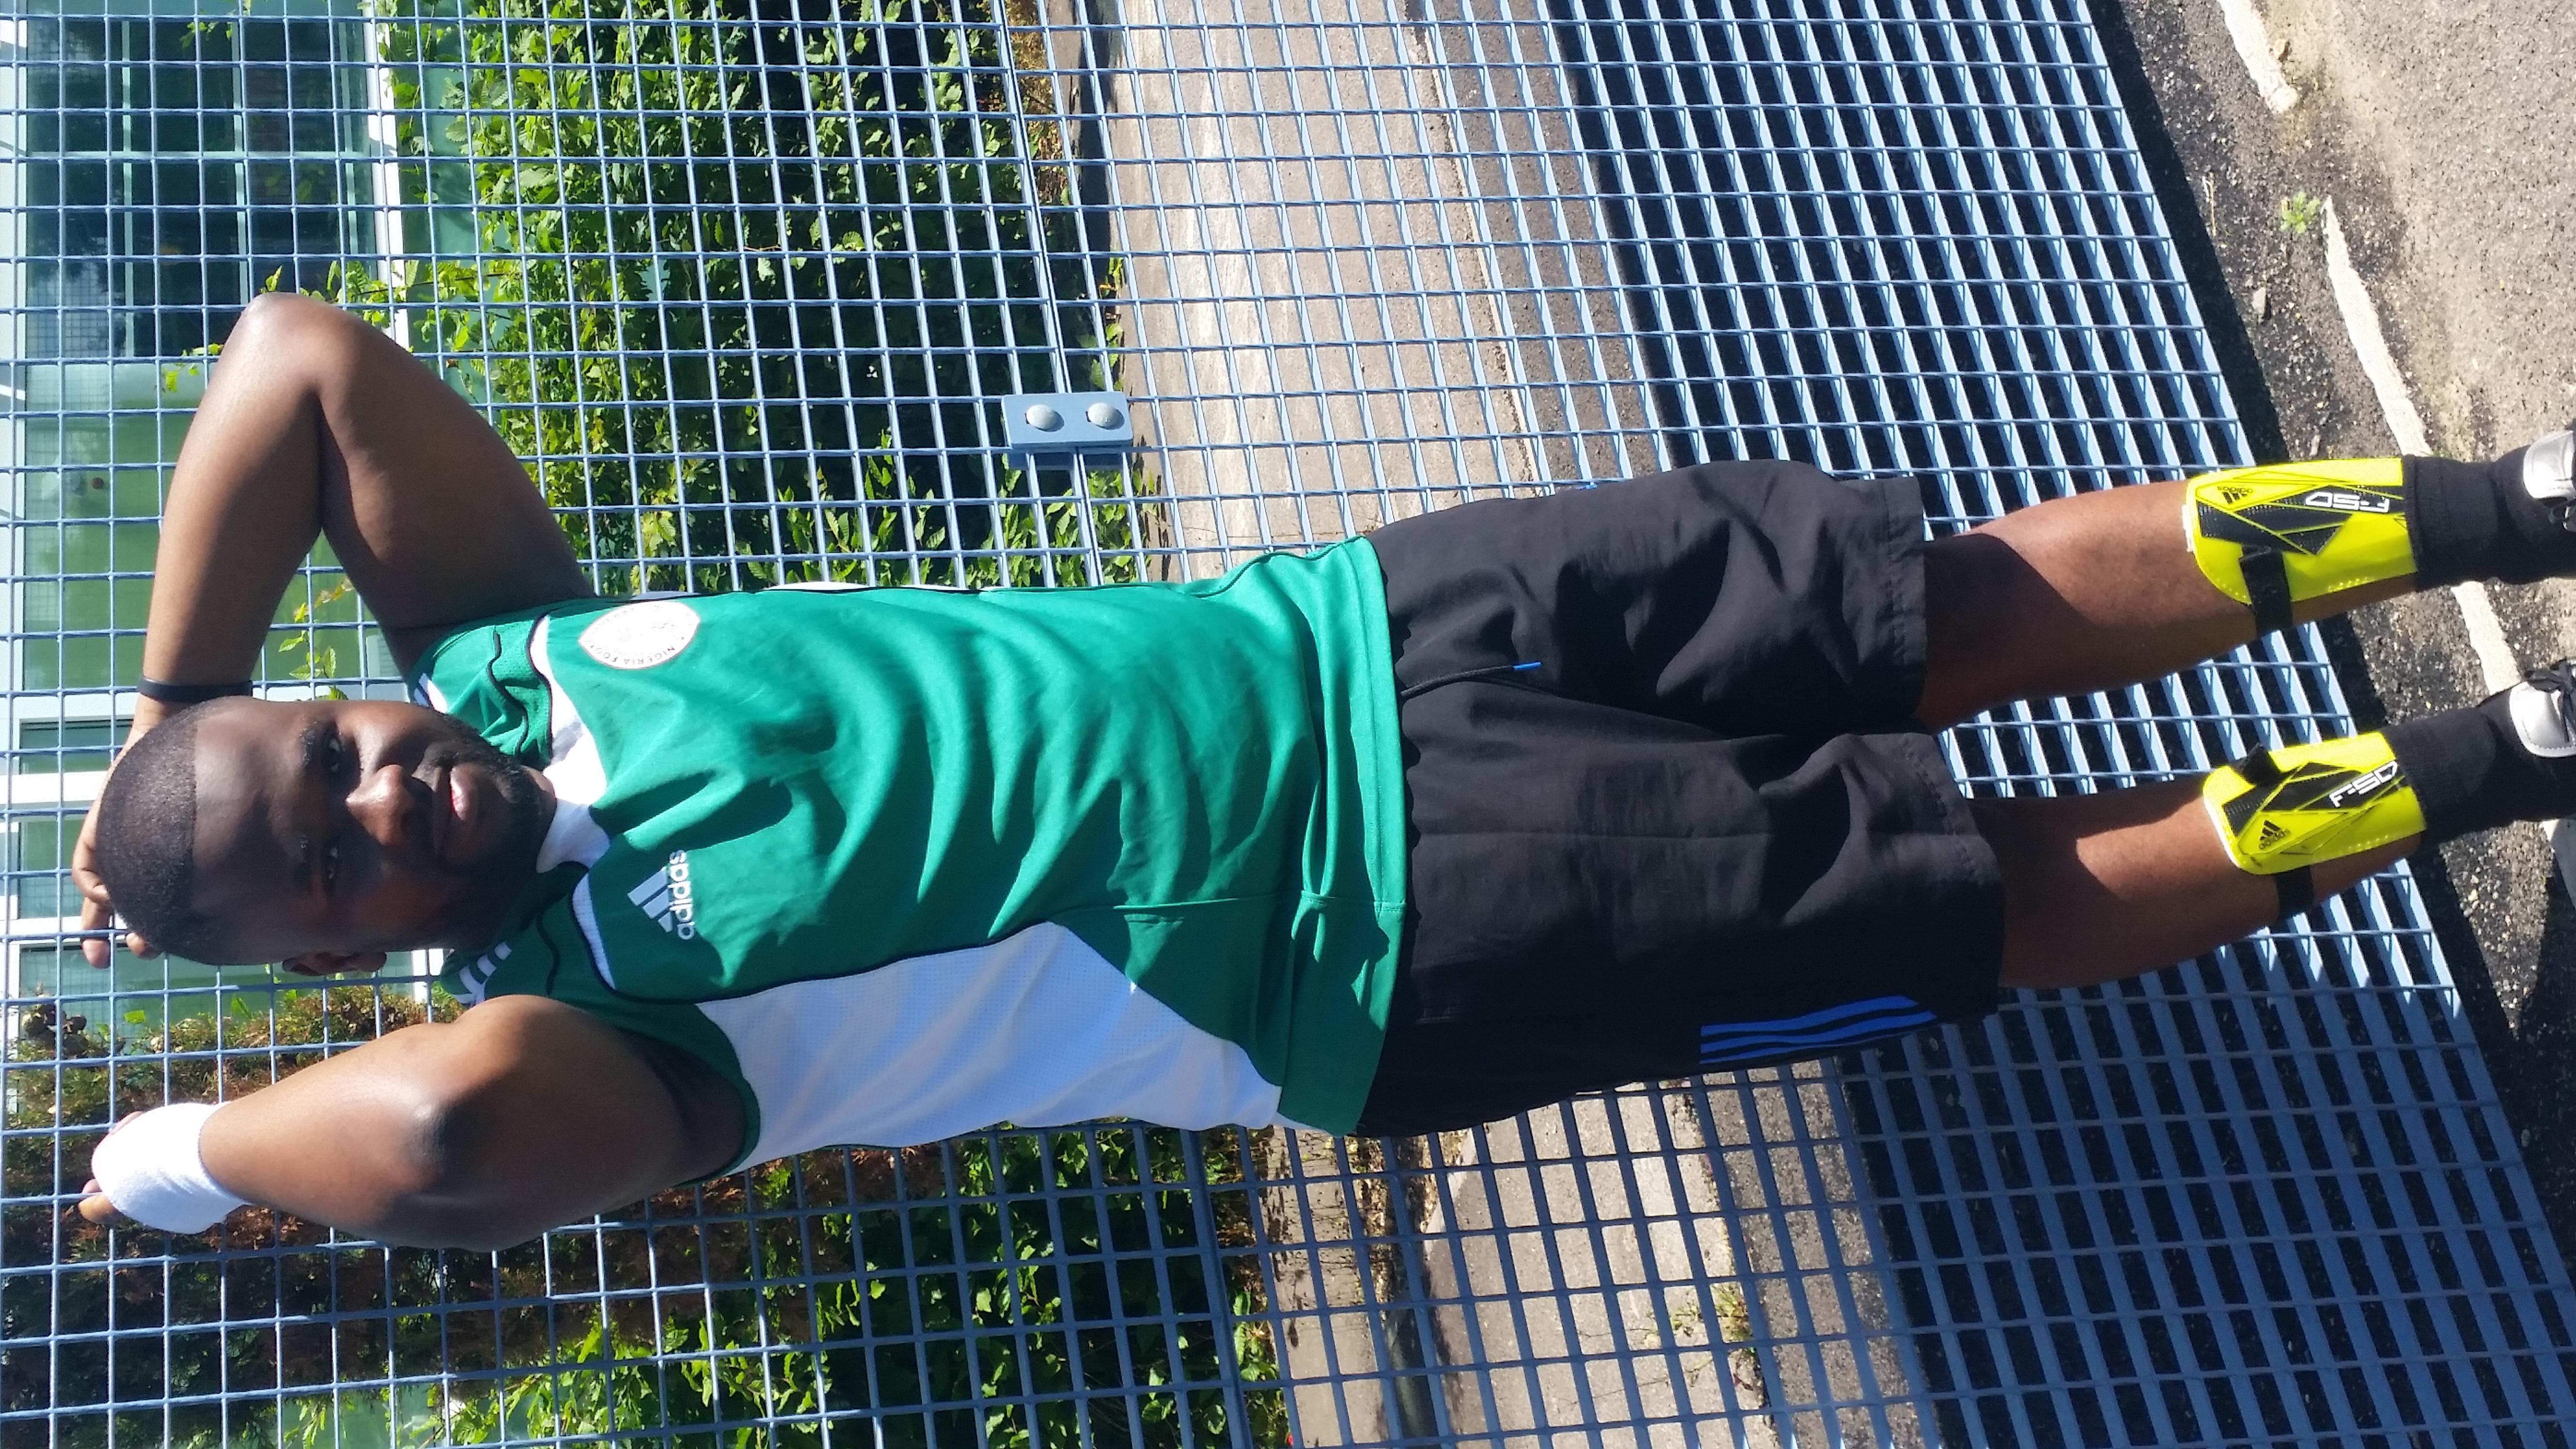 Mukhtar NCAA defender